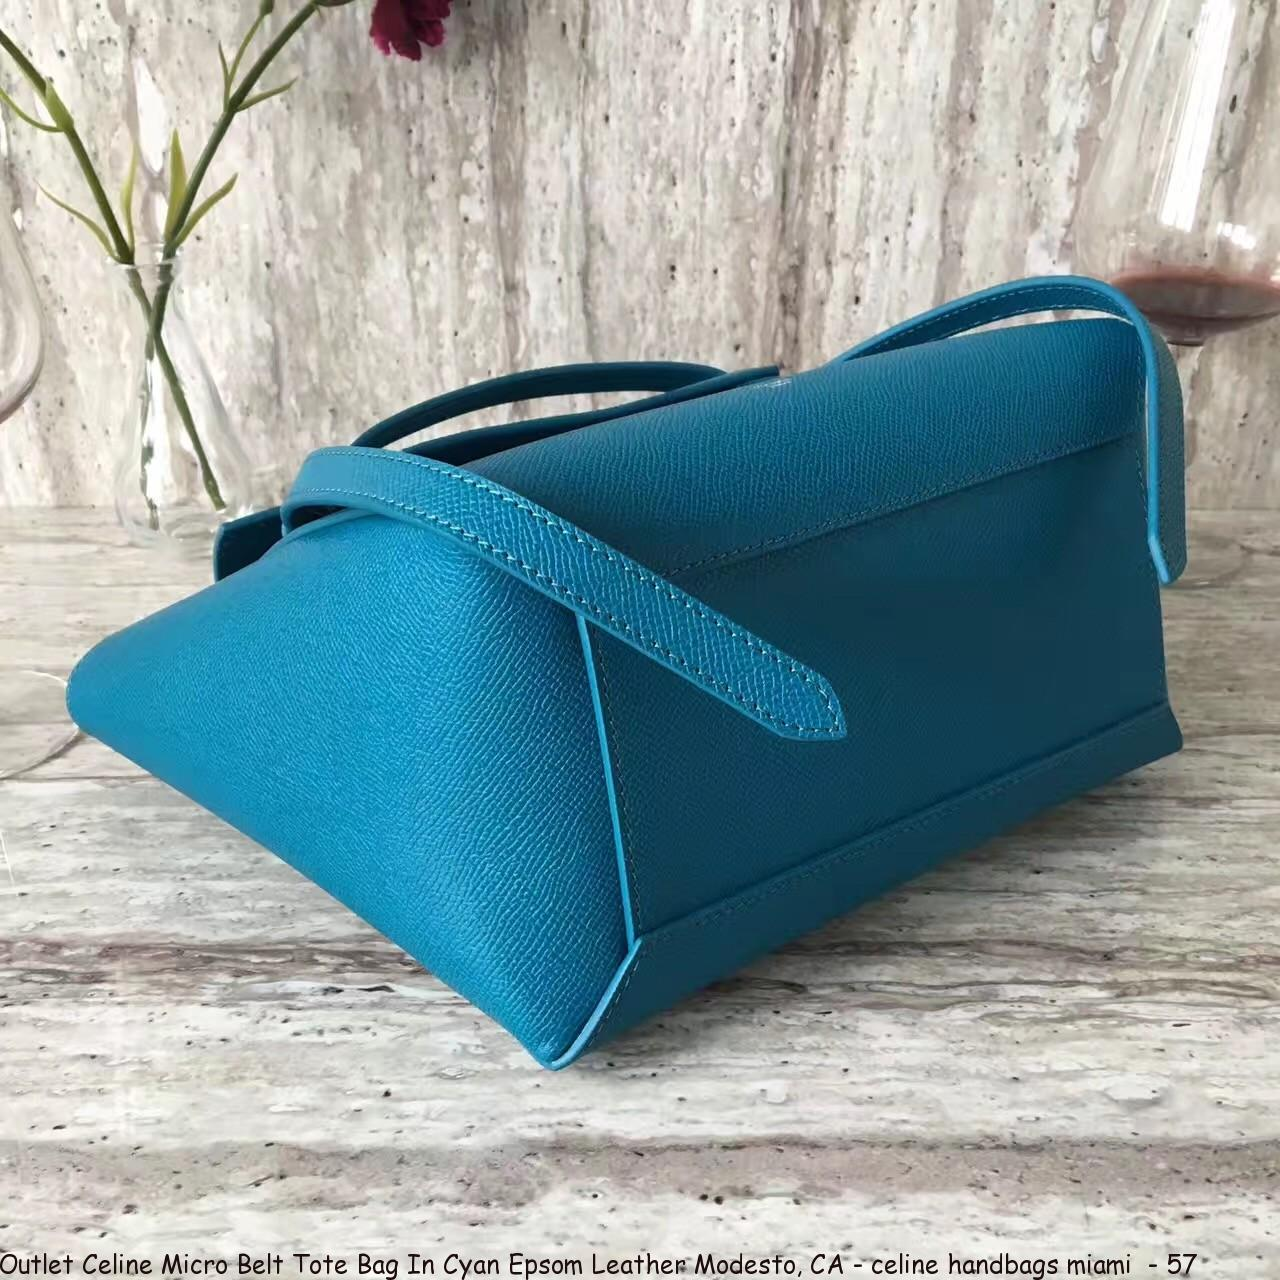 80463fe23ef9 Outlet Celine Micro Belt Tote Bag In Cyan Epsom Leather Modesto